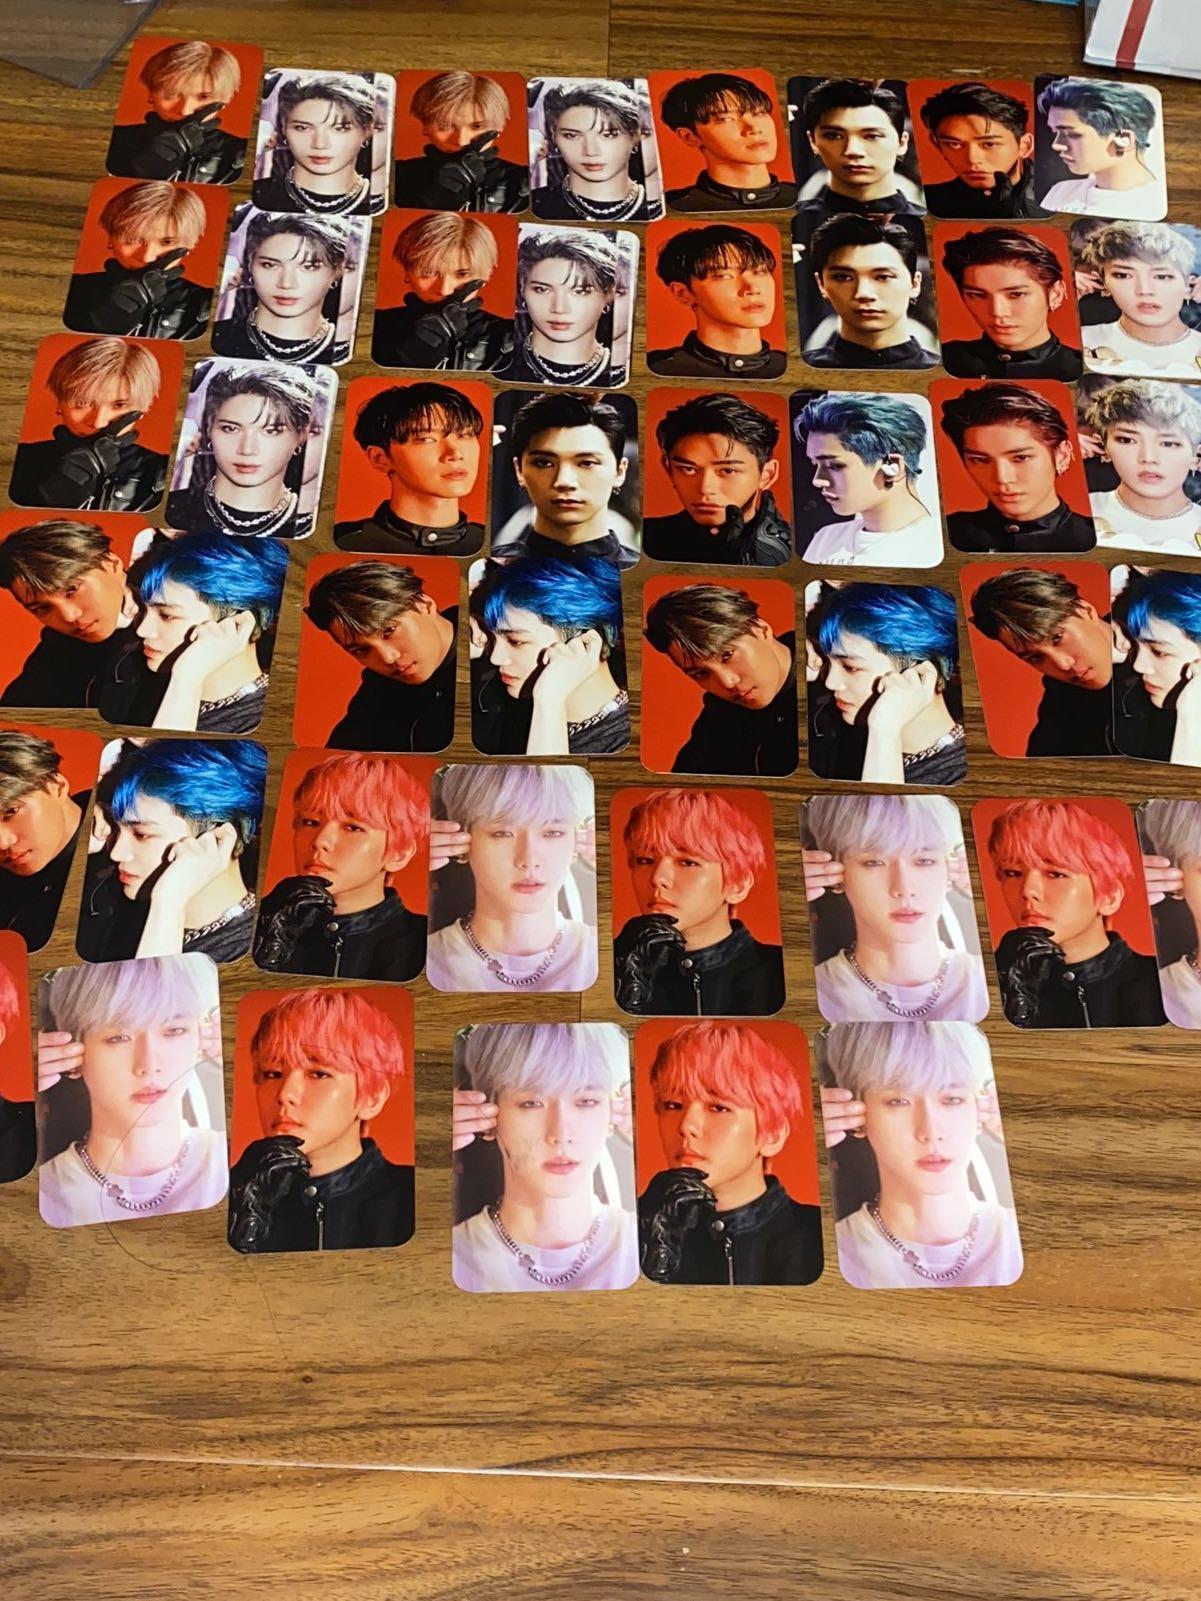 SuperM Tour Photocard PC 2.0 Taemin Shinee Exo WayV NCT